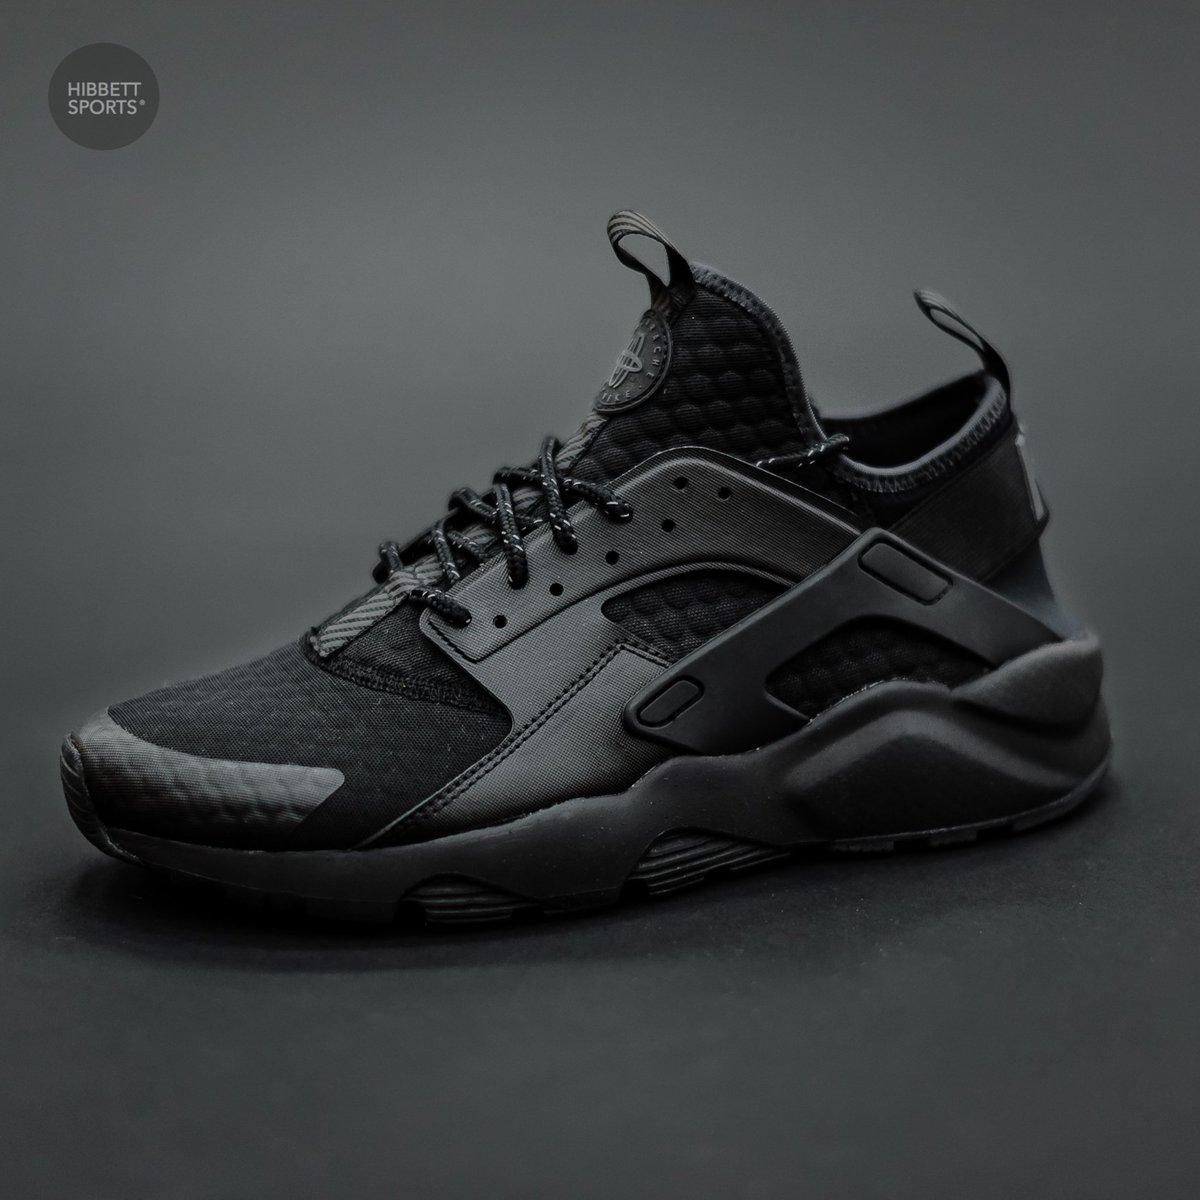 2a857facba8a ... usa hibbett sports on twitter that black on black does something to you  nike hibbett 6d92a